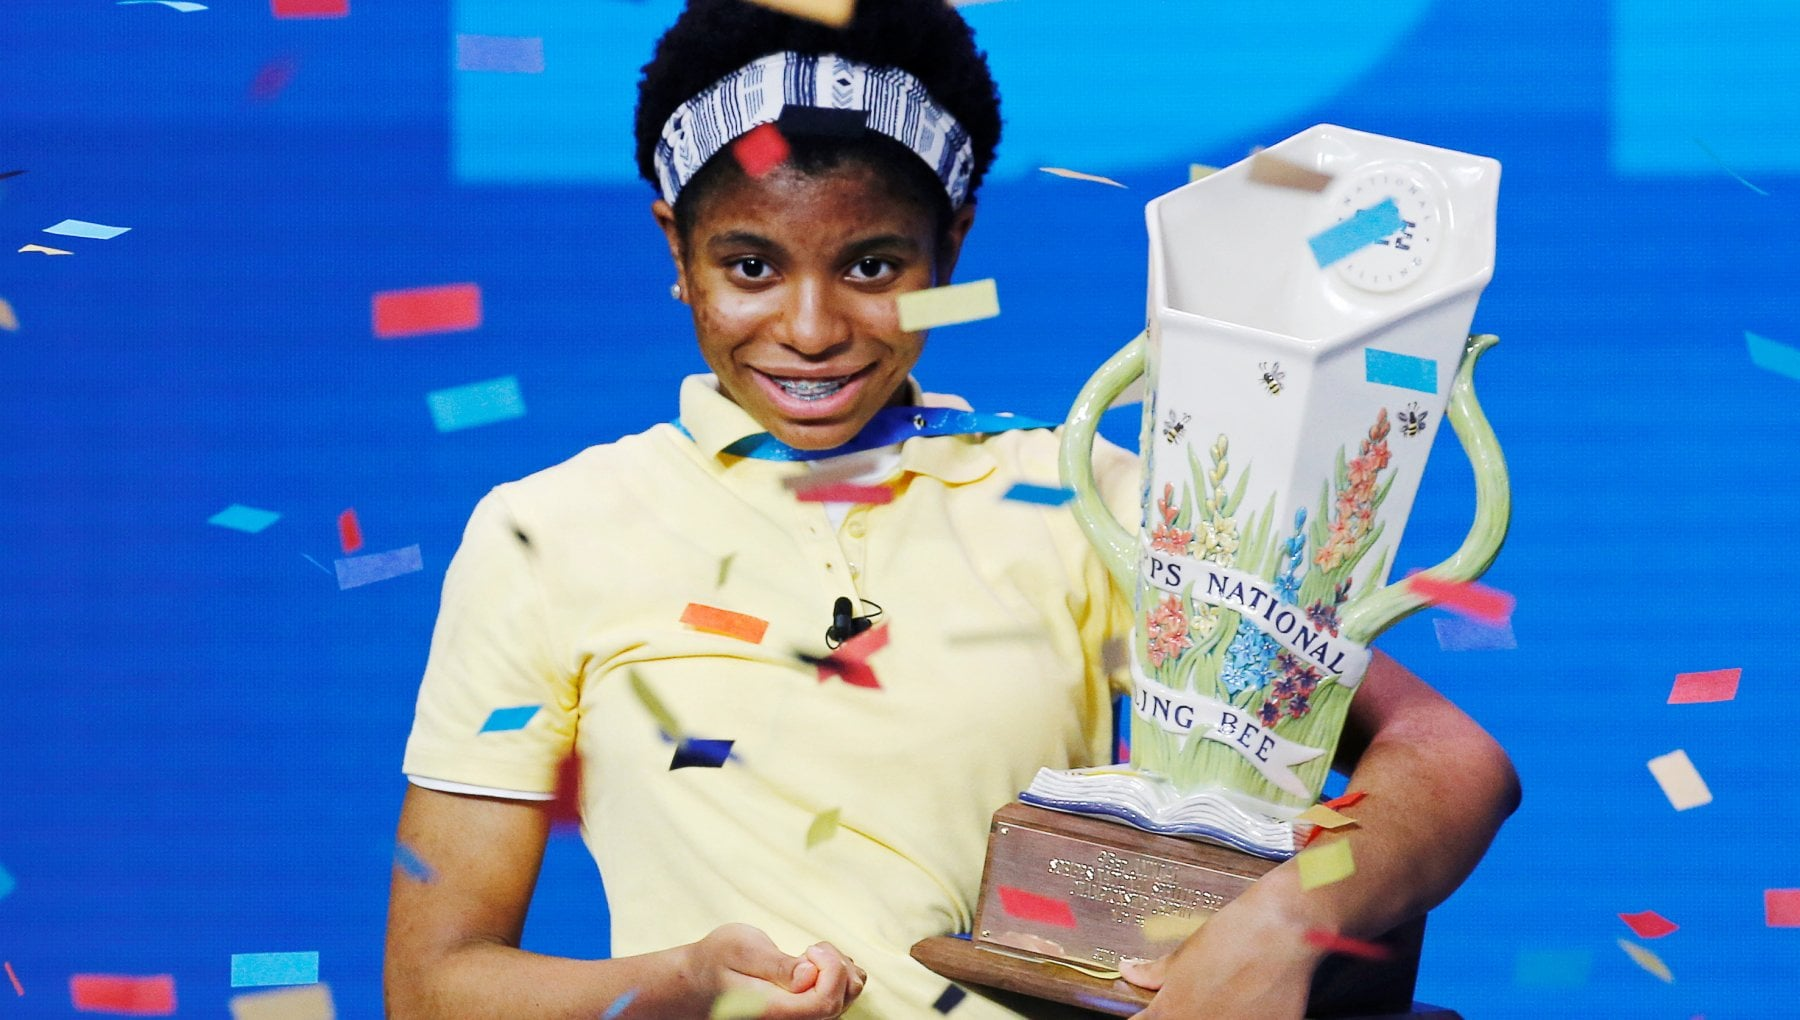 203231987 18f46e18 087c 4c8f af99 32e25bd151f7 - Stati Uniti, la 14enne Zaila è la prima afroamericana a vincere la gara nazionale di spelling